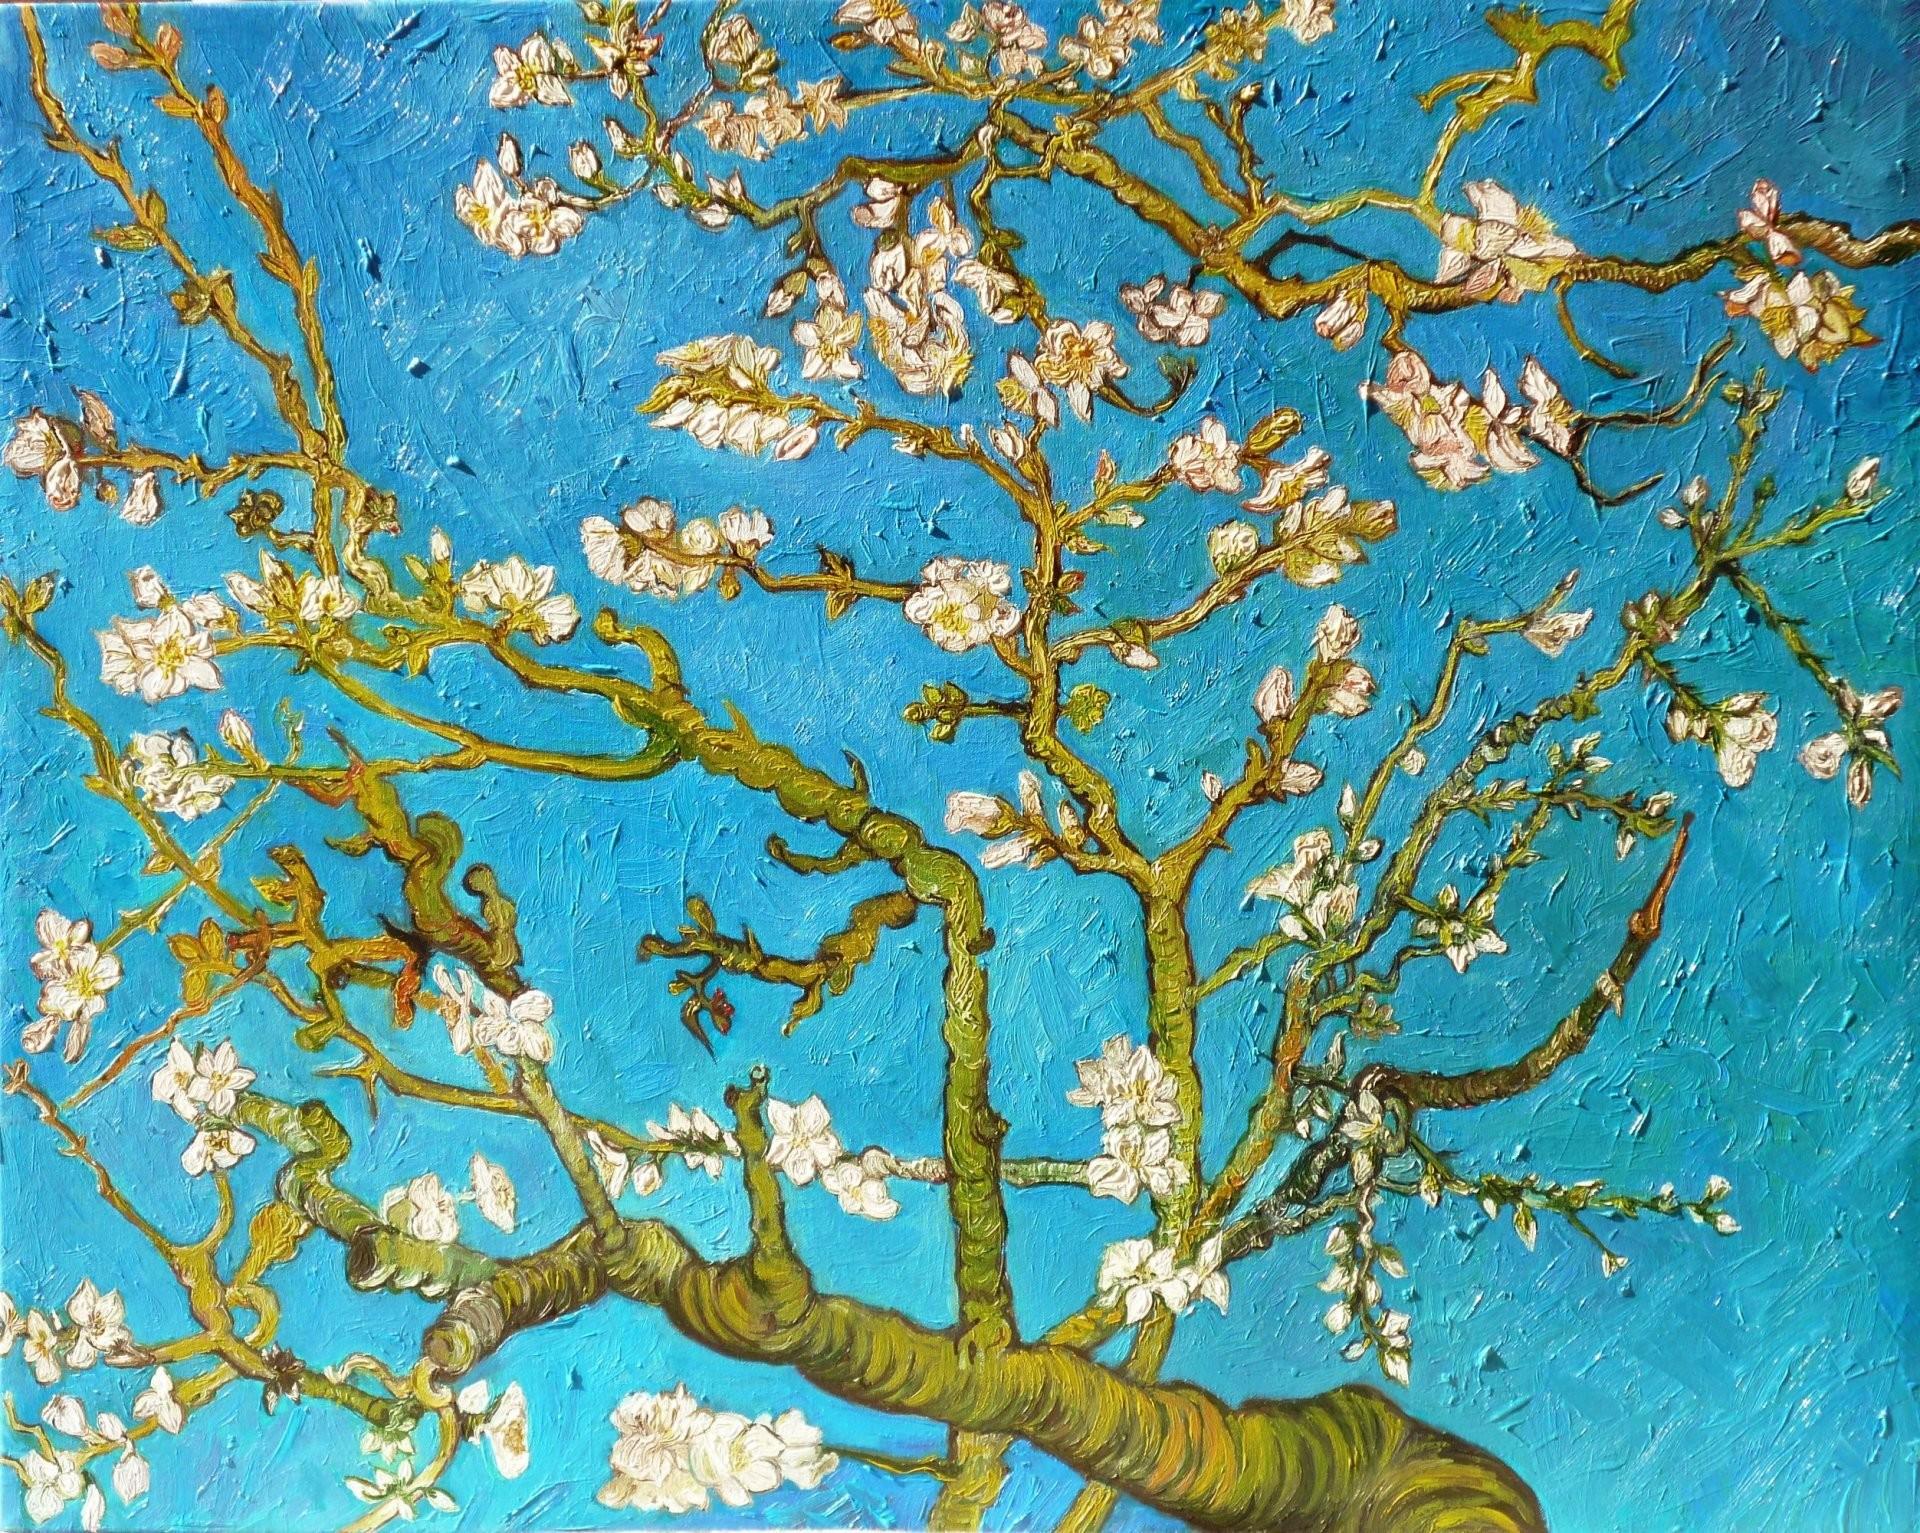 … almond tree vincent van gogh art blue pattern branch almond tree  vincent van gogh painting